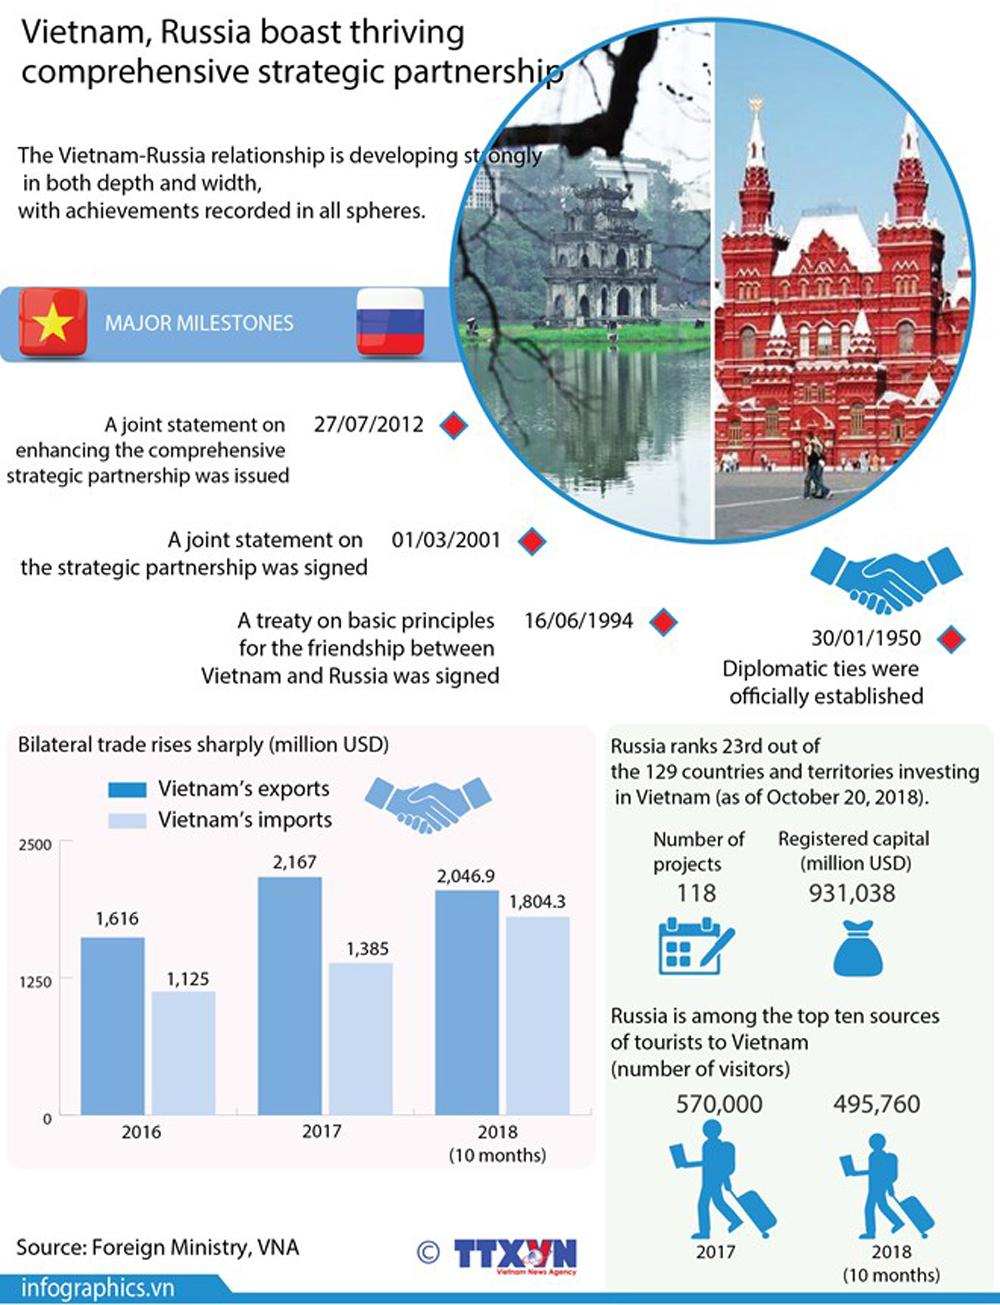 Vietnam, Russia, thriving partnership, comprehensive strategic, various achievement